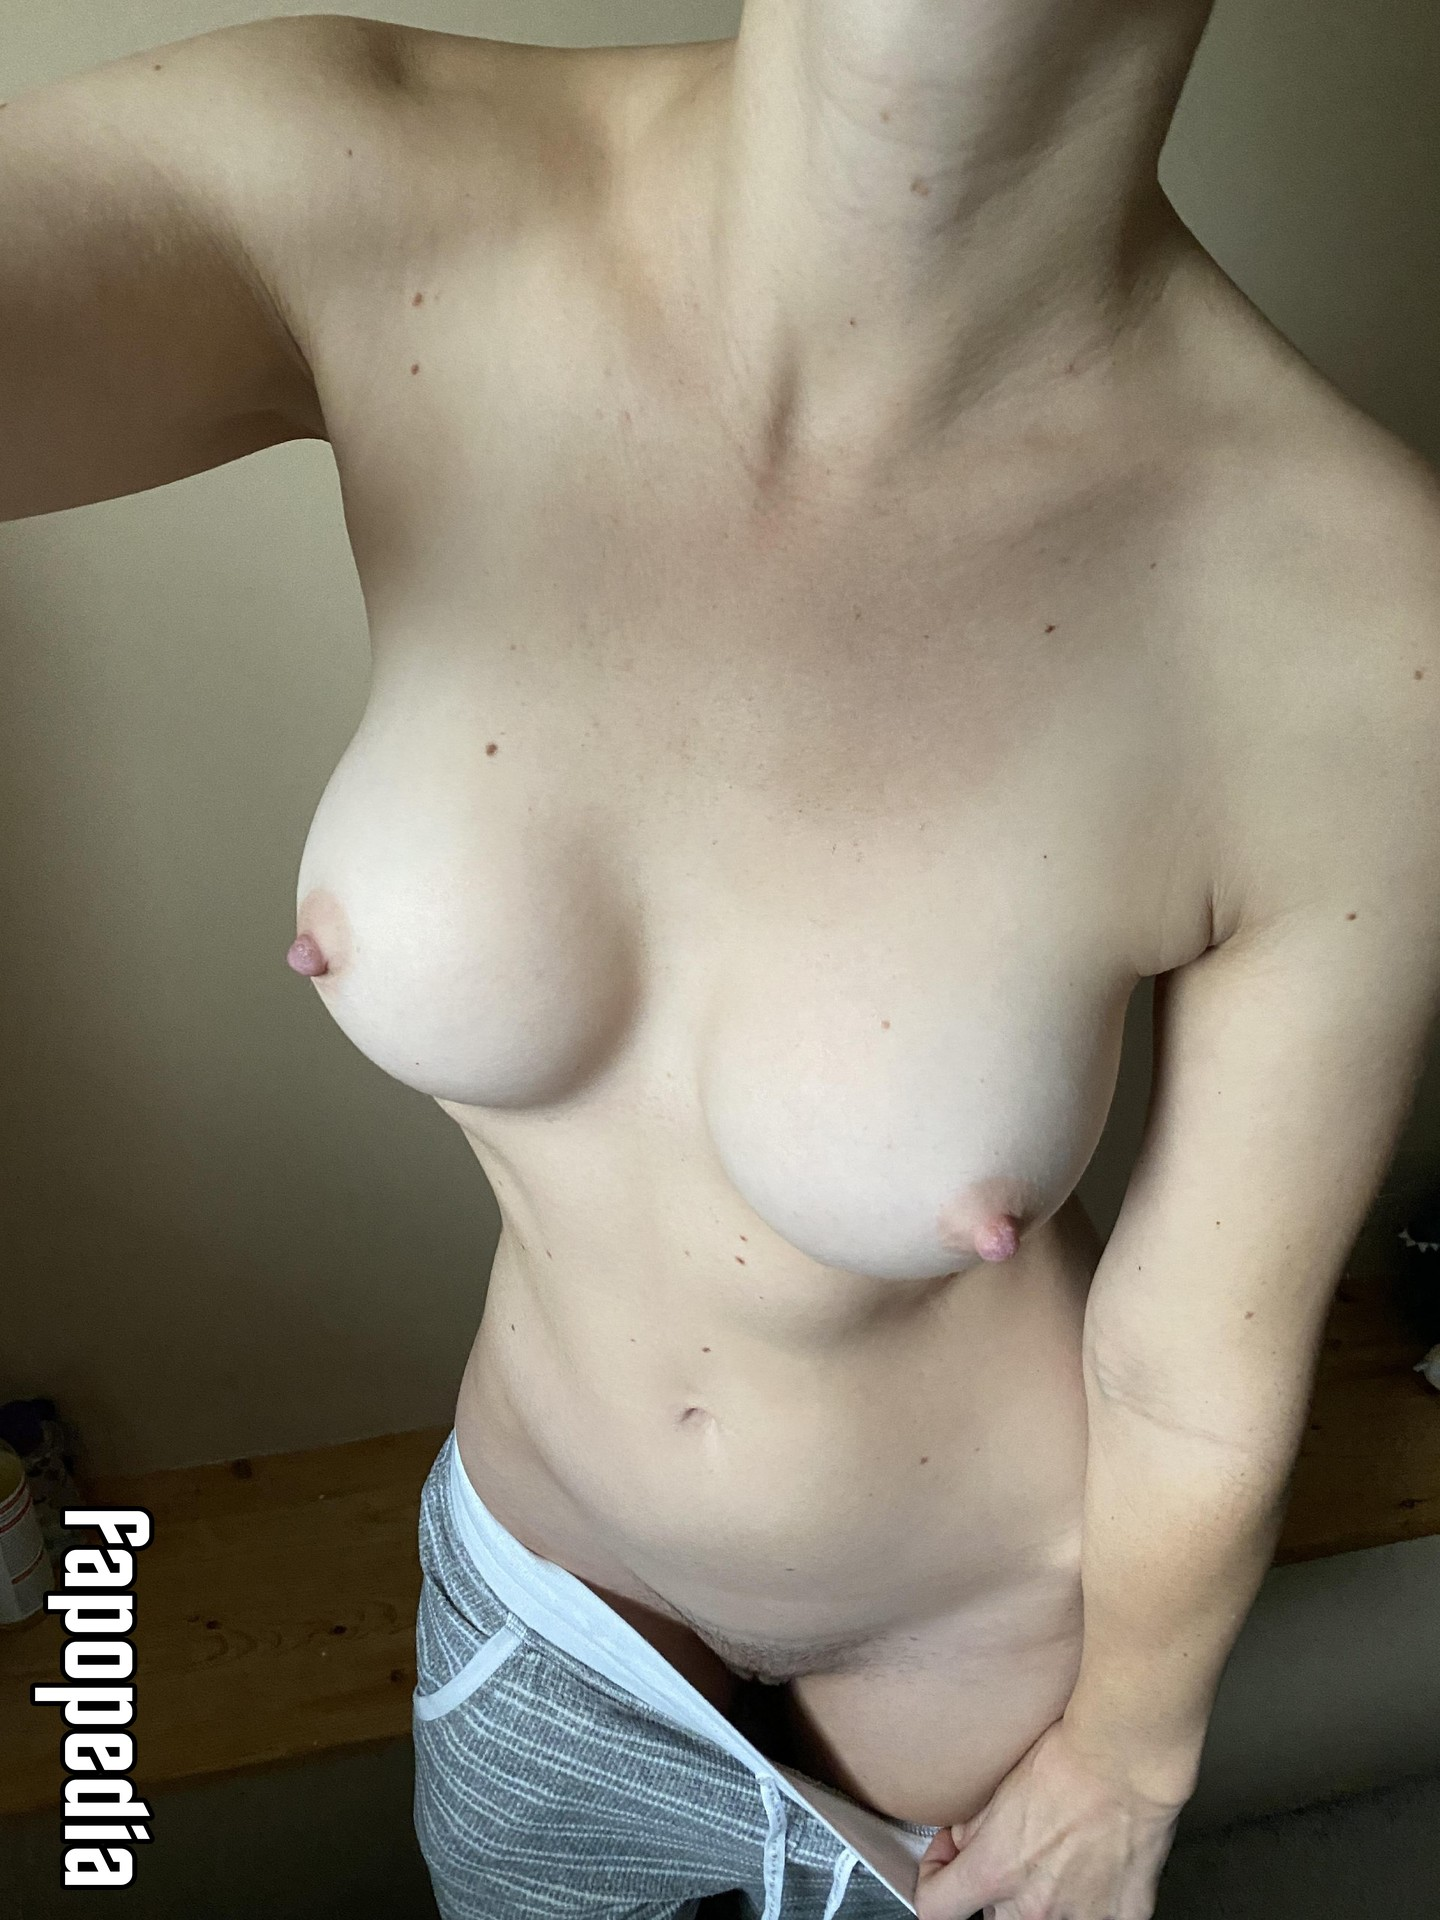 Irish_hiccup Nude Leaks